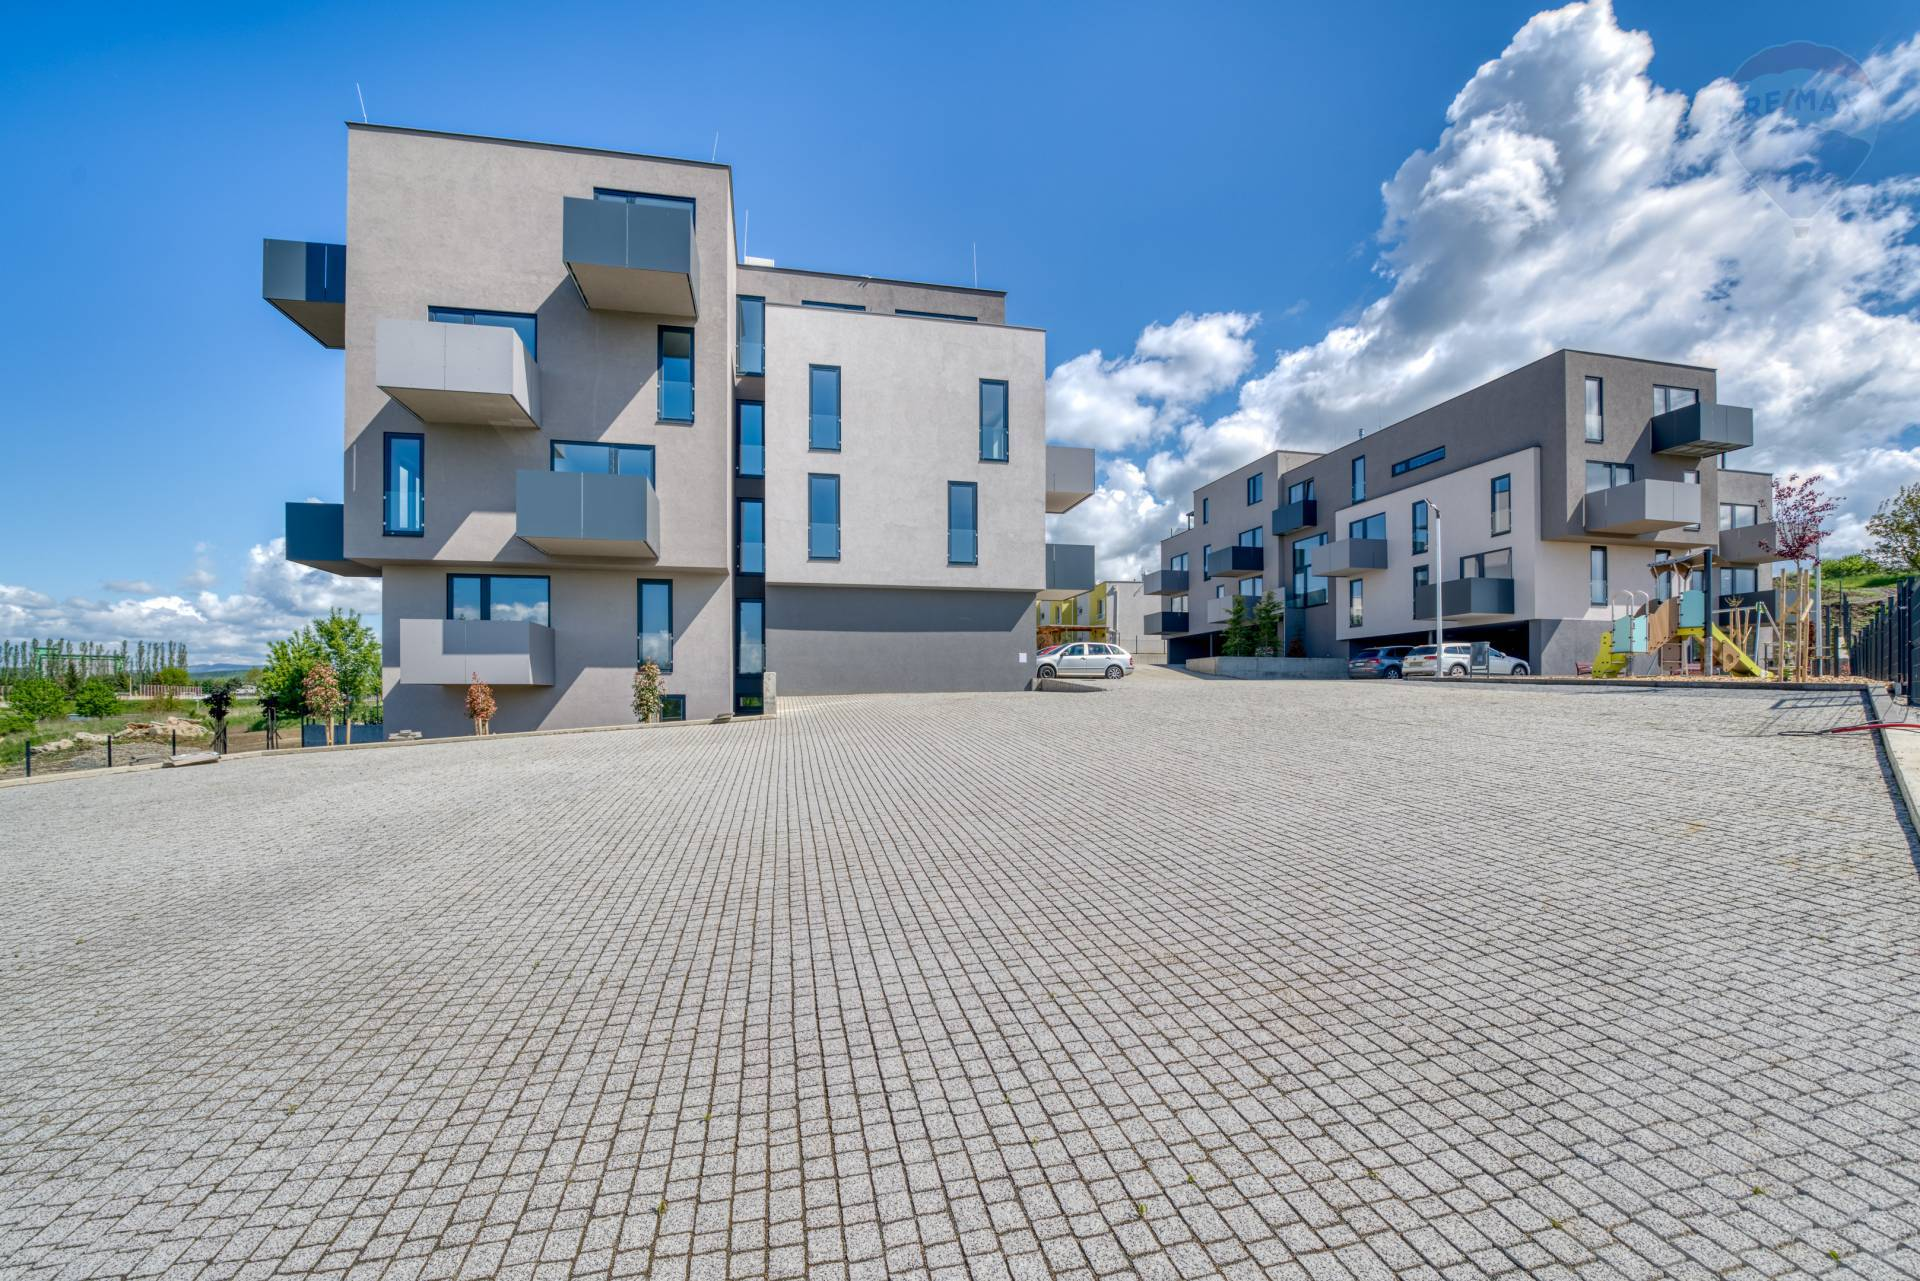 5 izbový byt na predaj, novostavba, projekt Viladomy Ľubotice